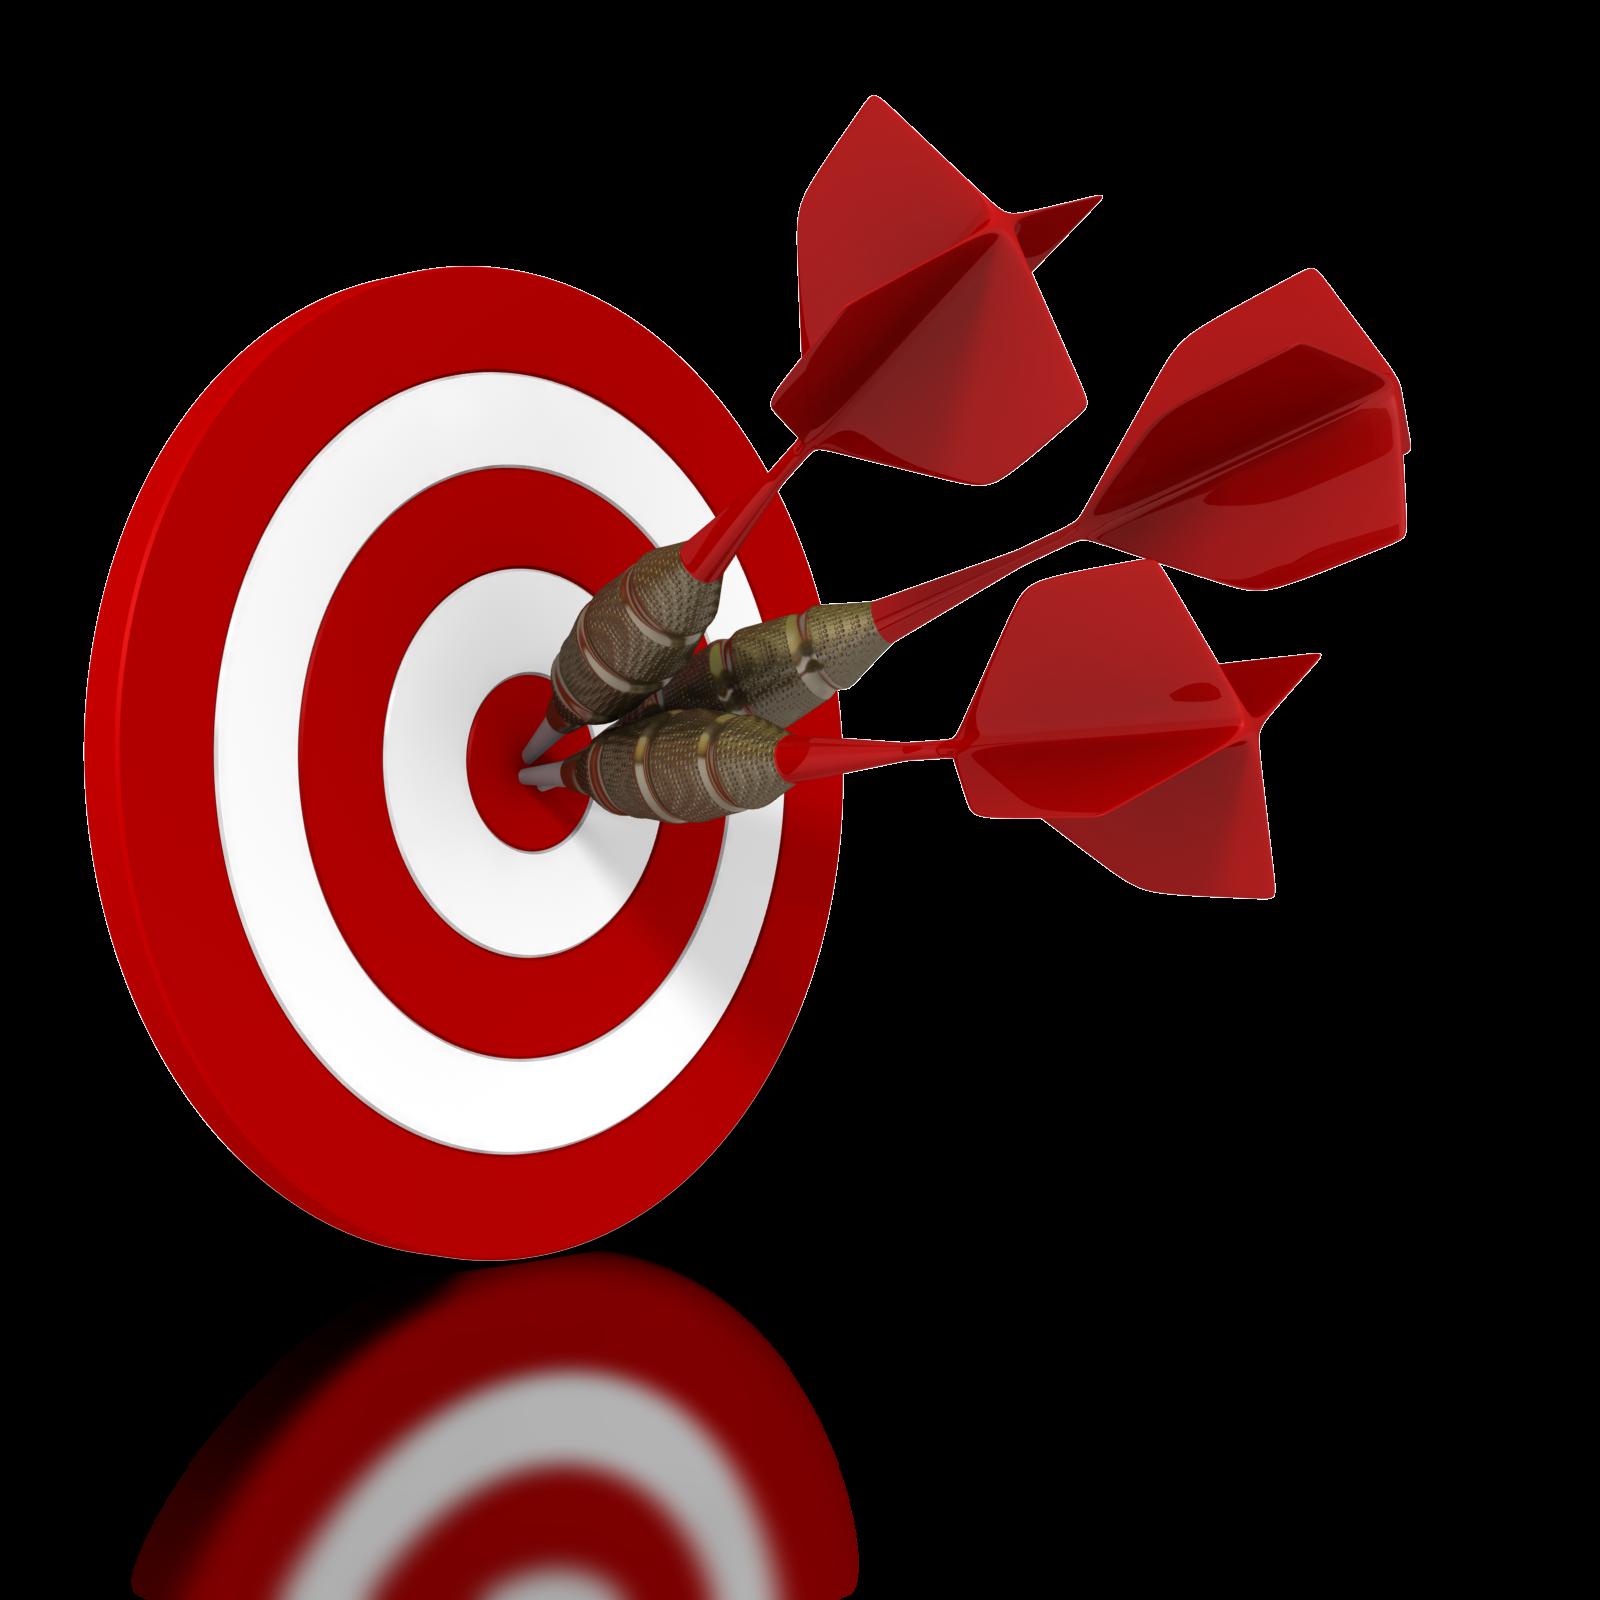 Goals clipart personal goal. Target jokingart com download